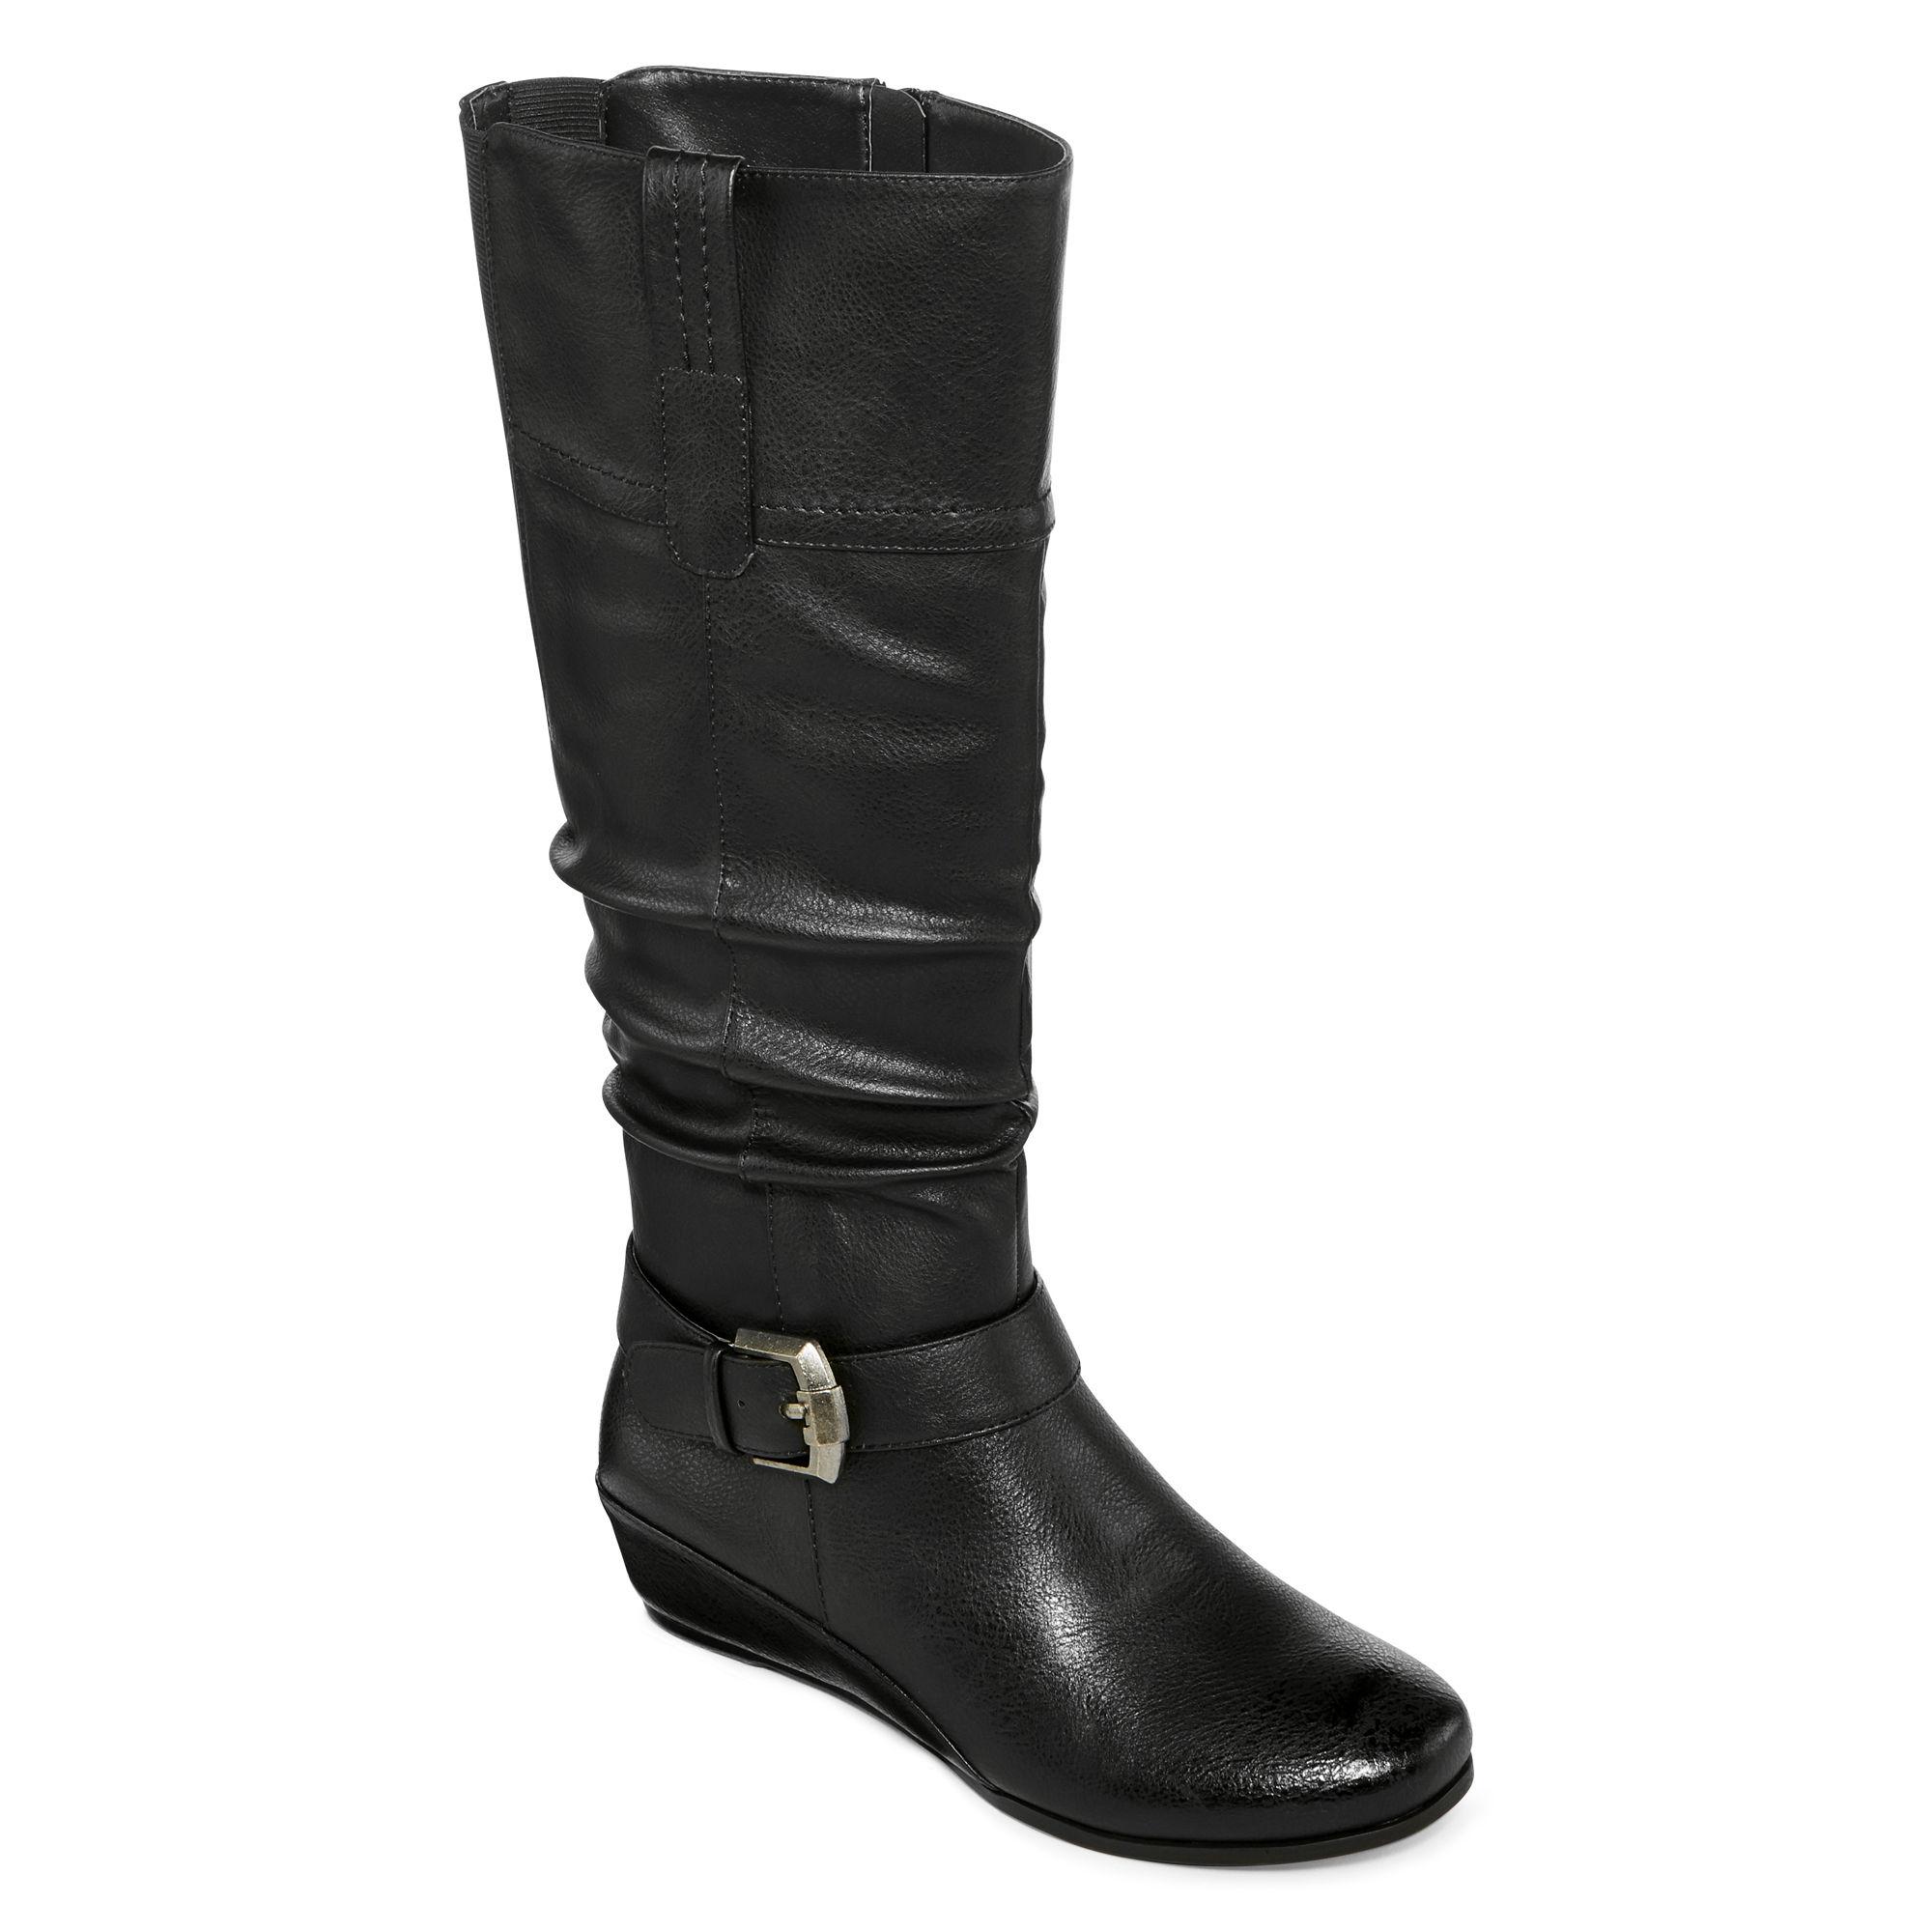 Yuu Simona Wide Calf Wedge Buckled Boots